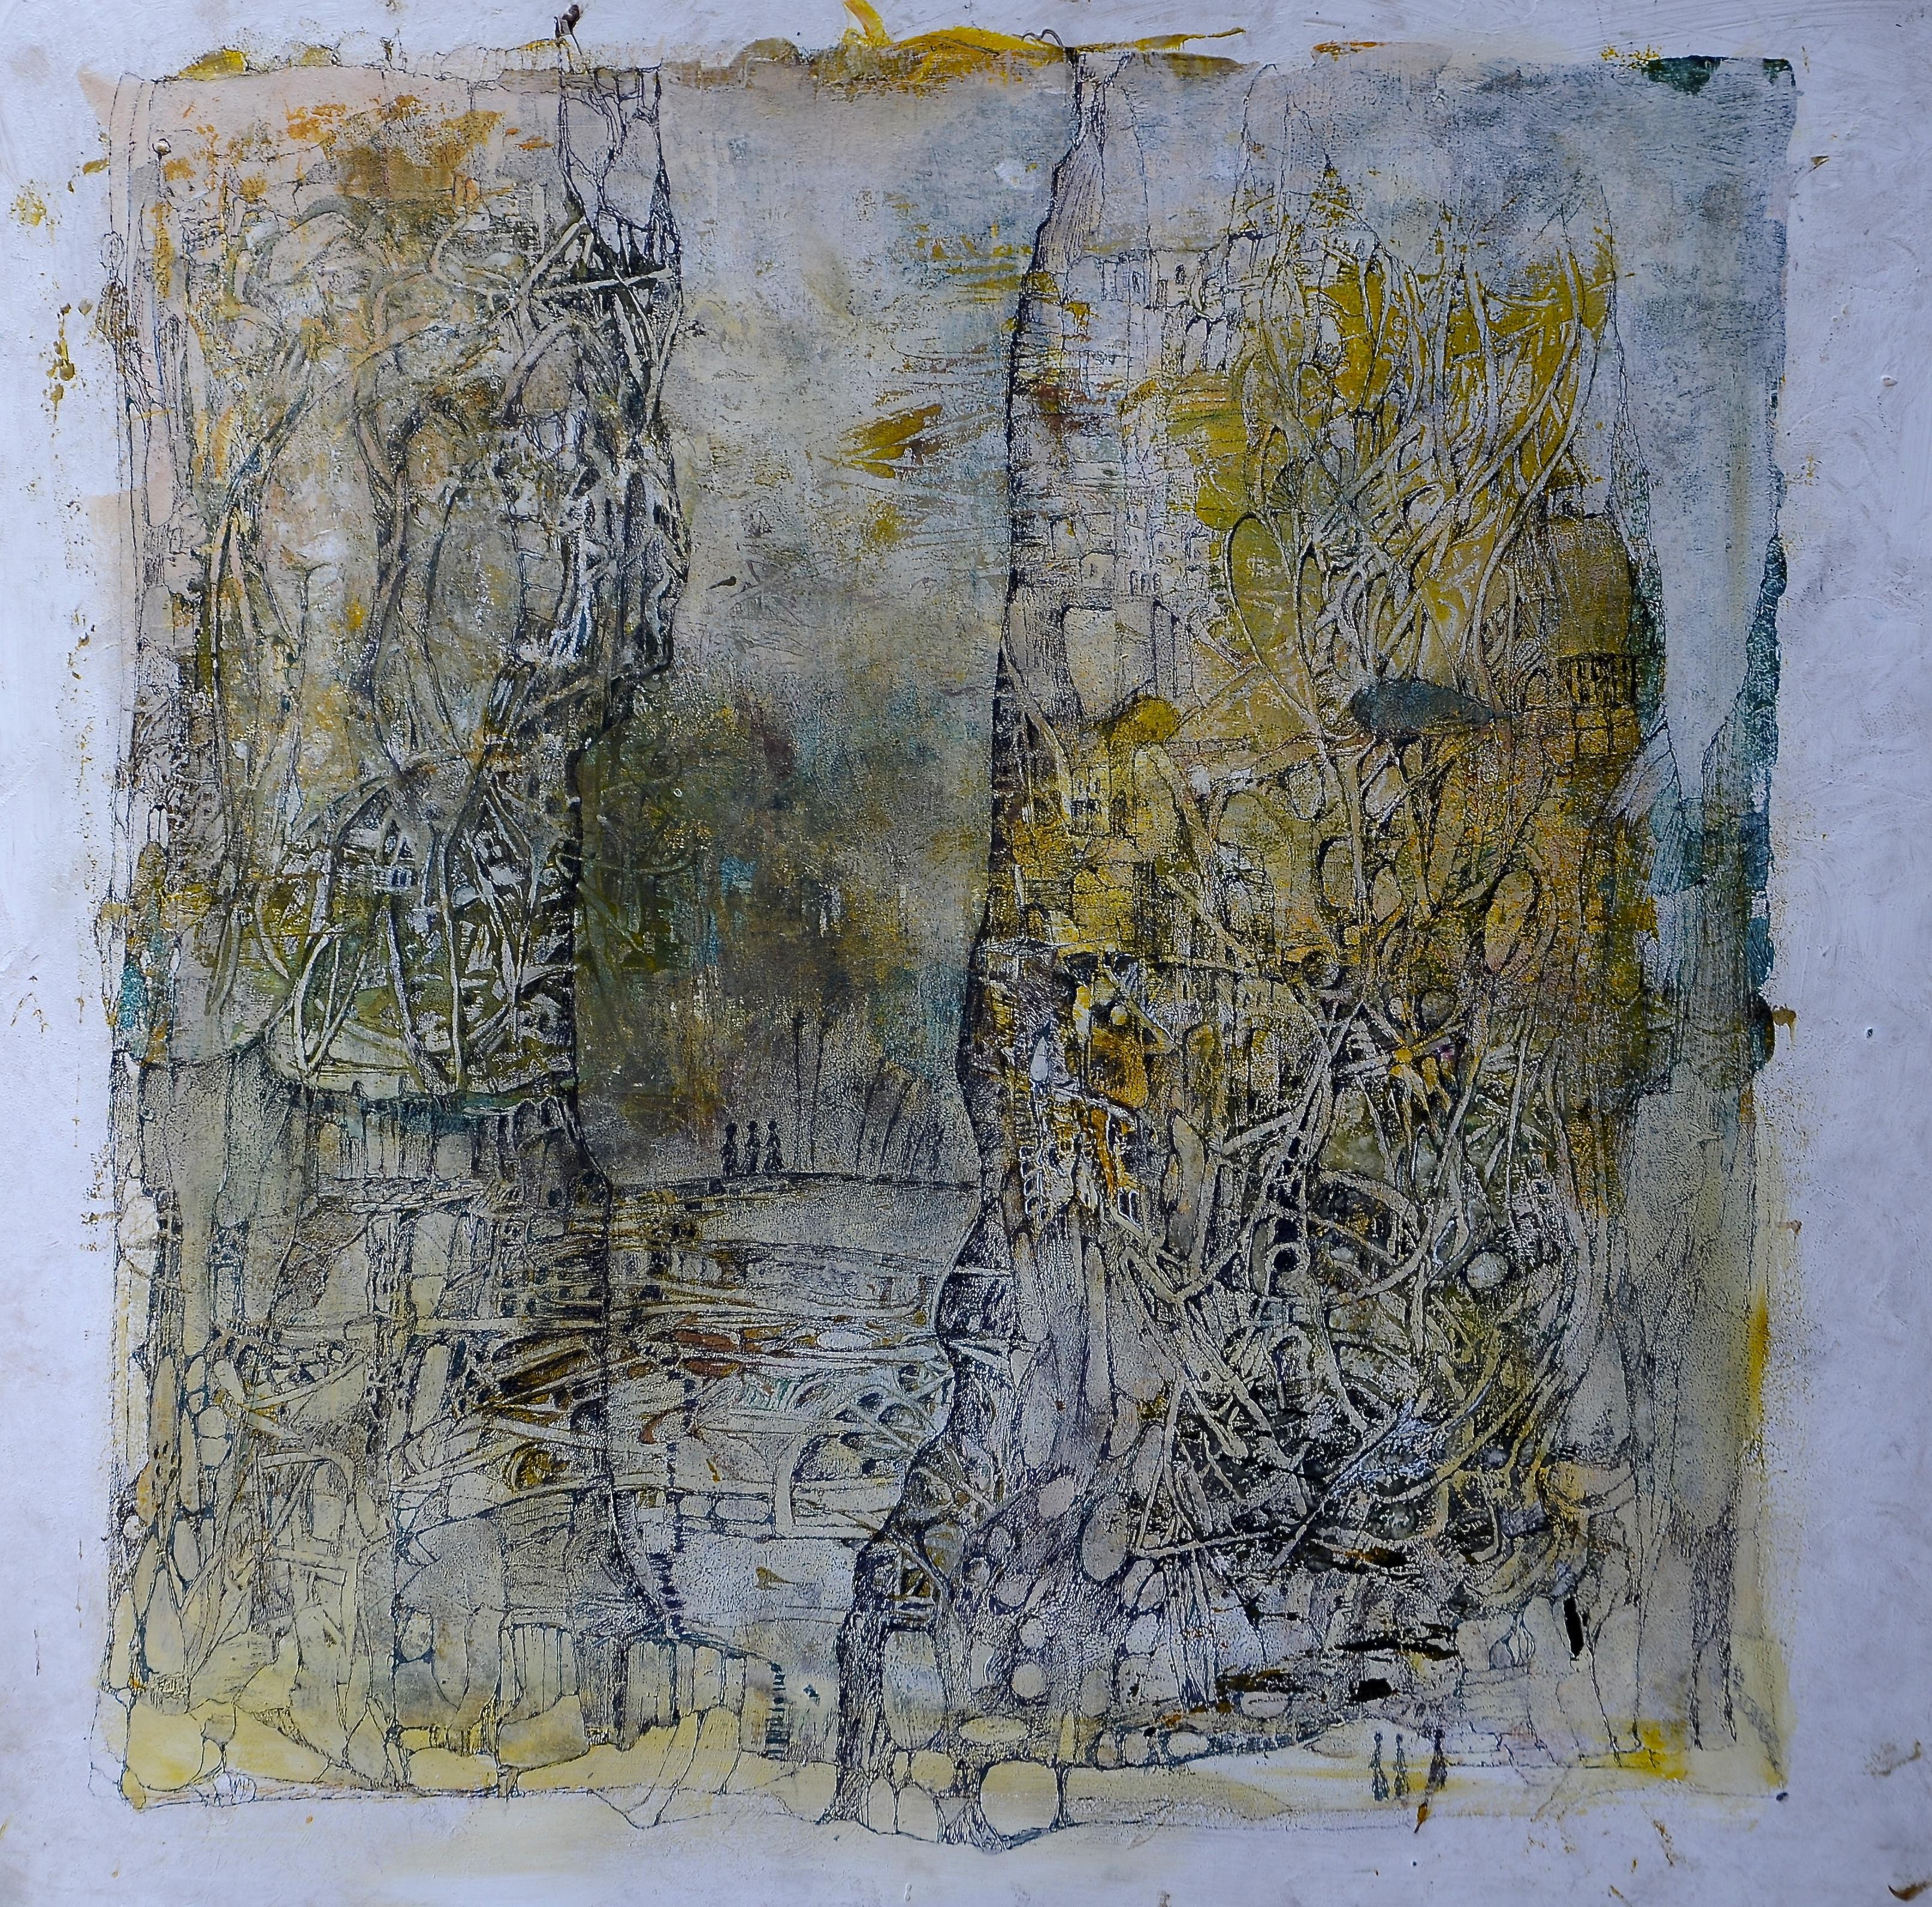 utopia,acryl,tusche, auf MDF,50x50cm,2015.JPG